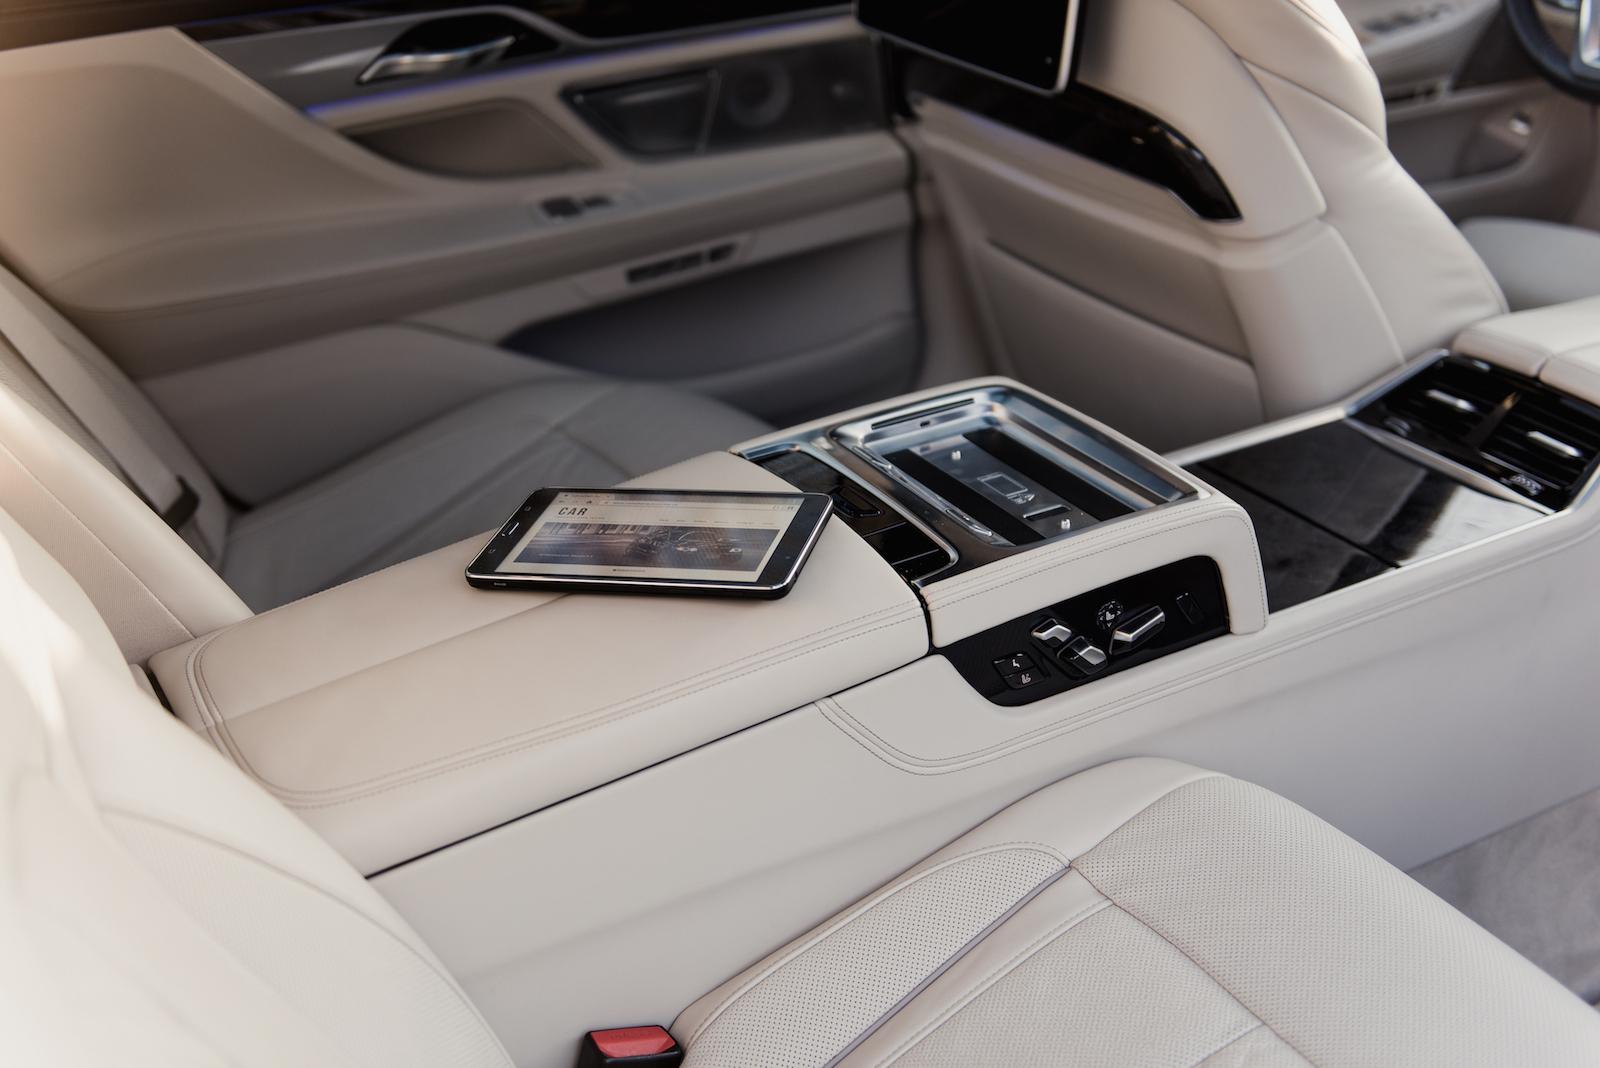 2016 BMW 750Li XDrive Executive Lounge Samsung Tablet